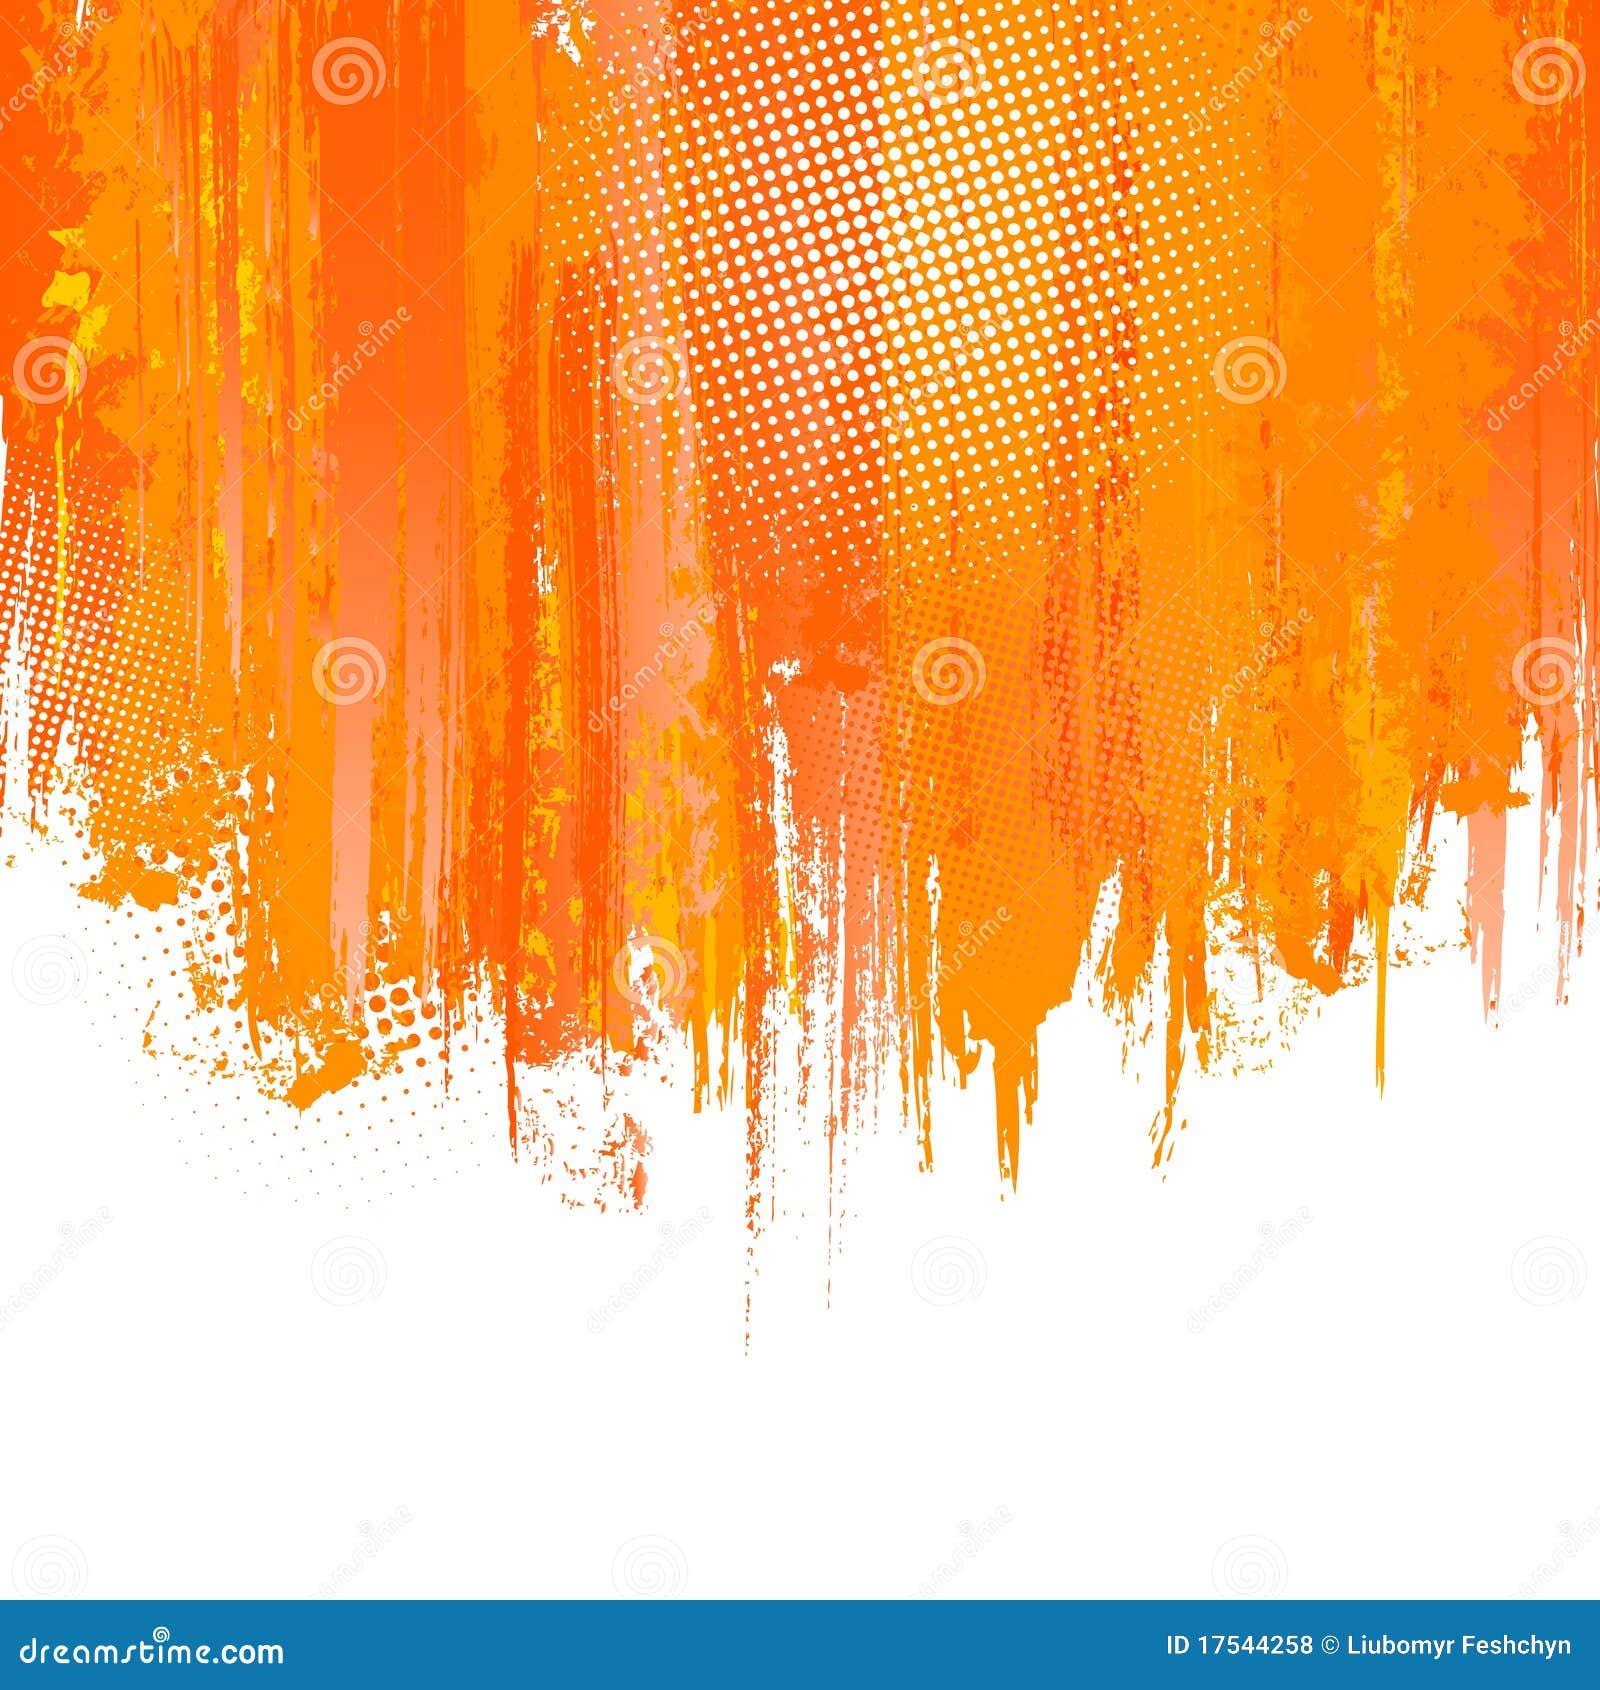 La pintura anaranjada salpica el fondo. Vector